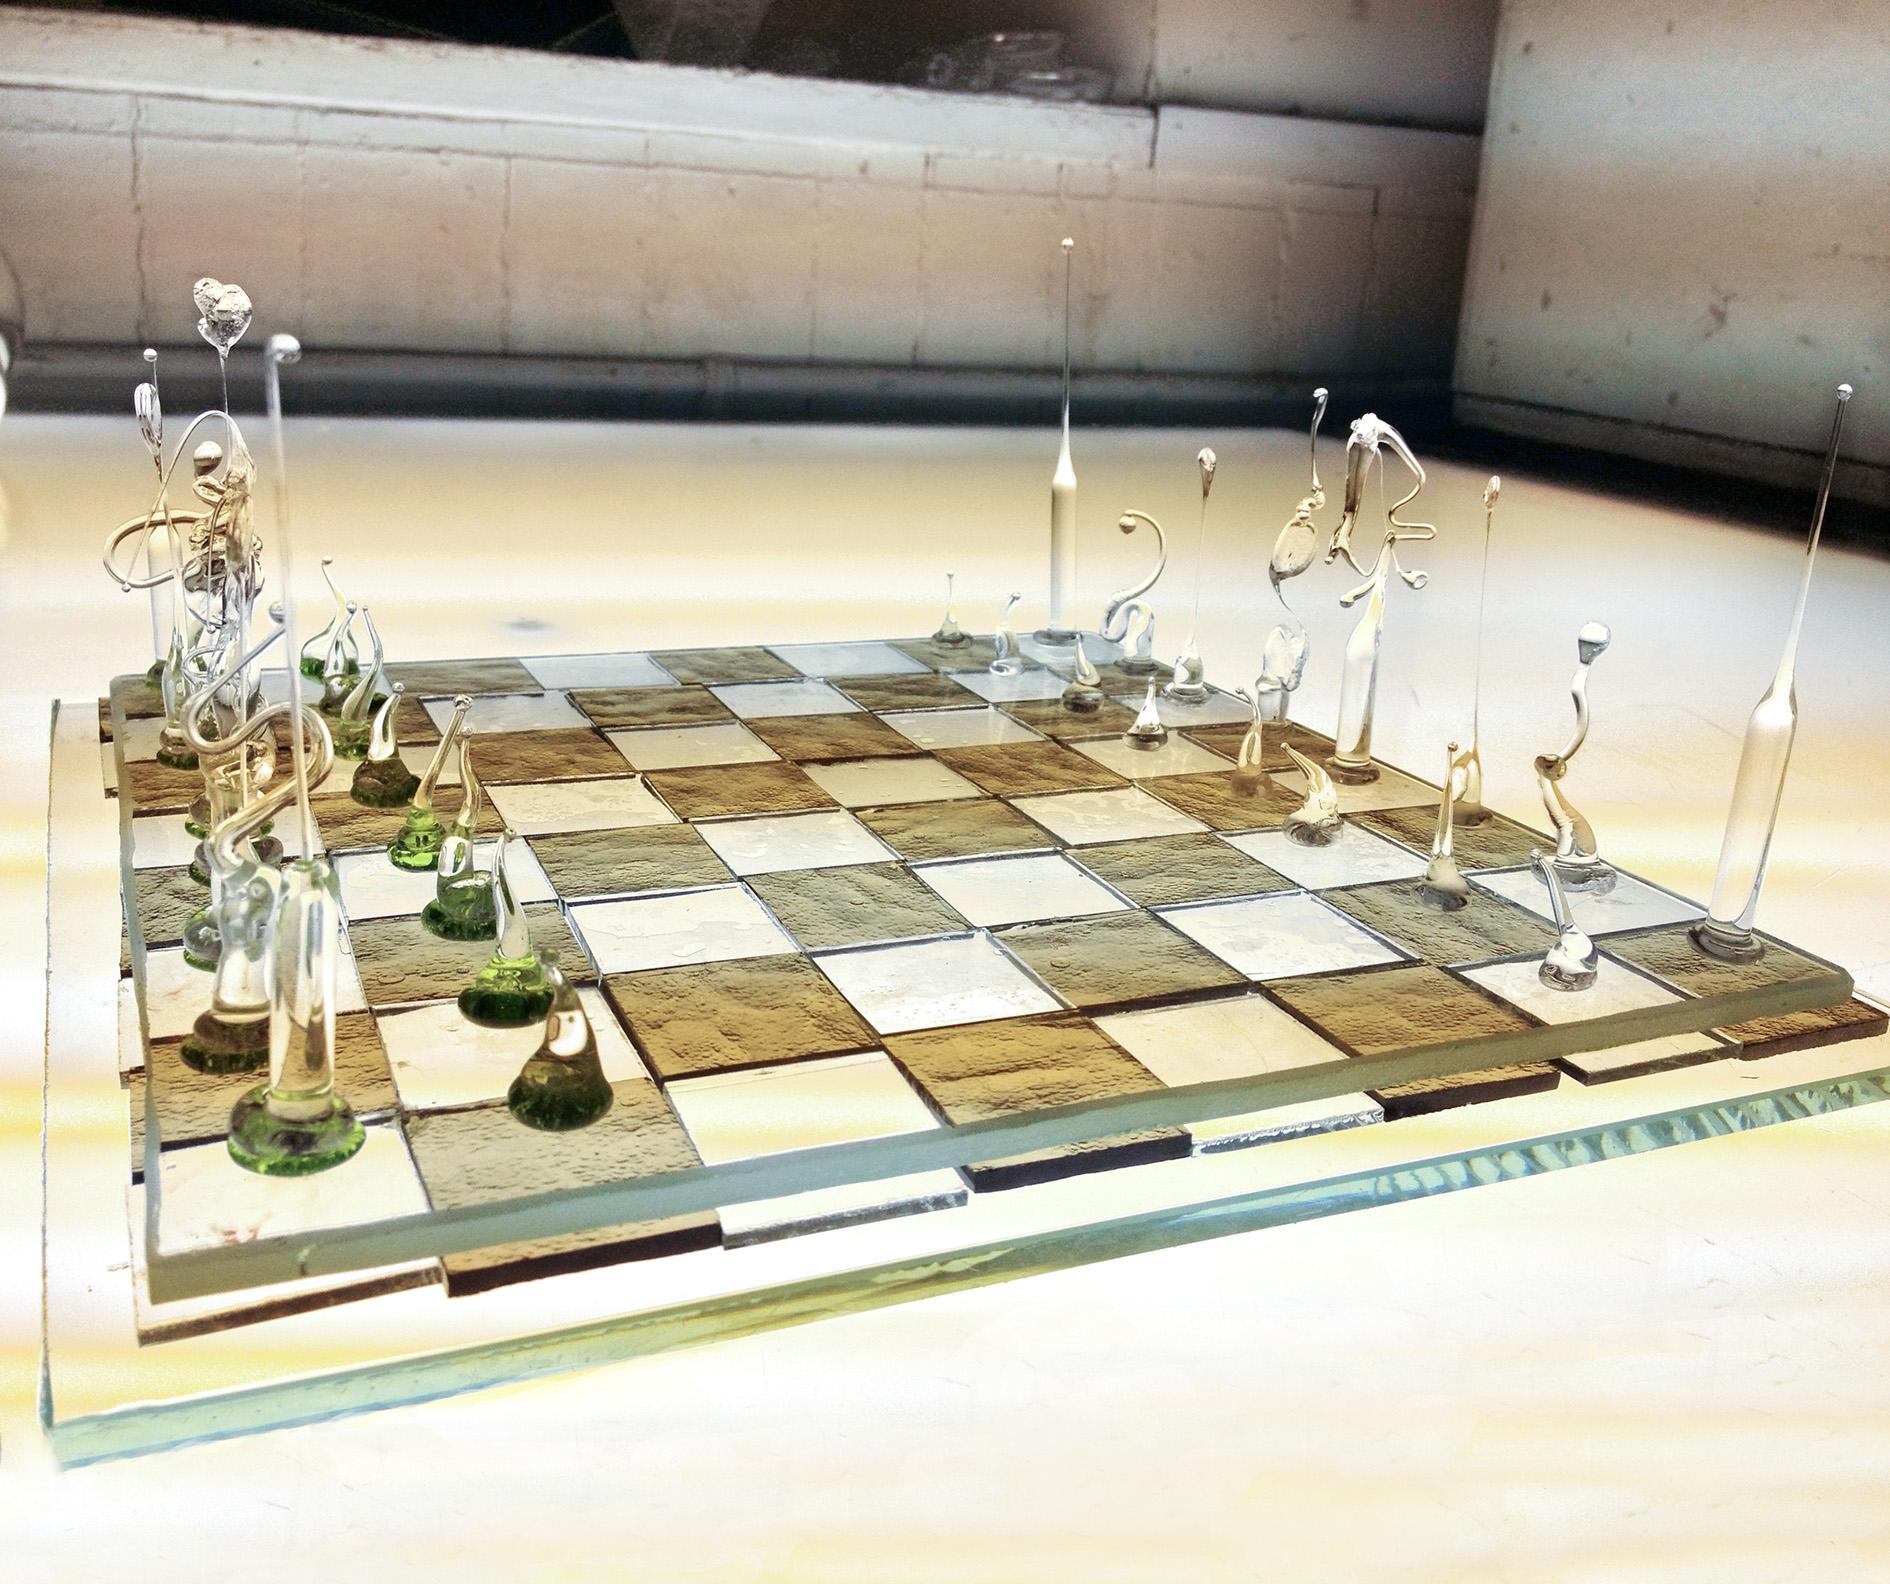 13 chess set i.jpg